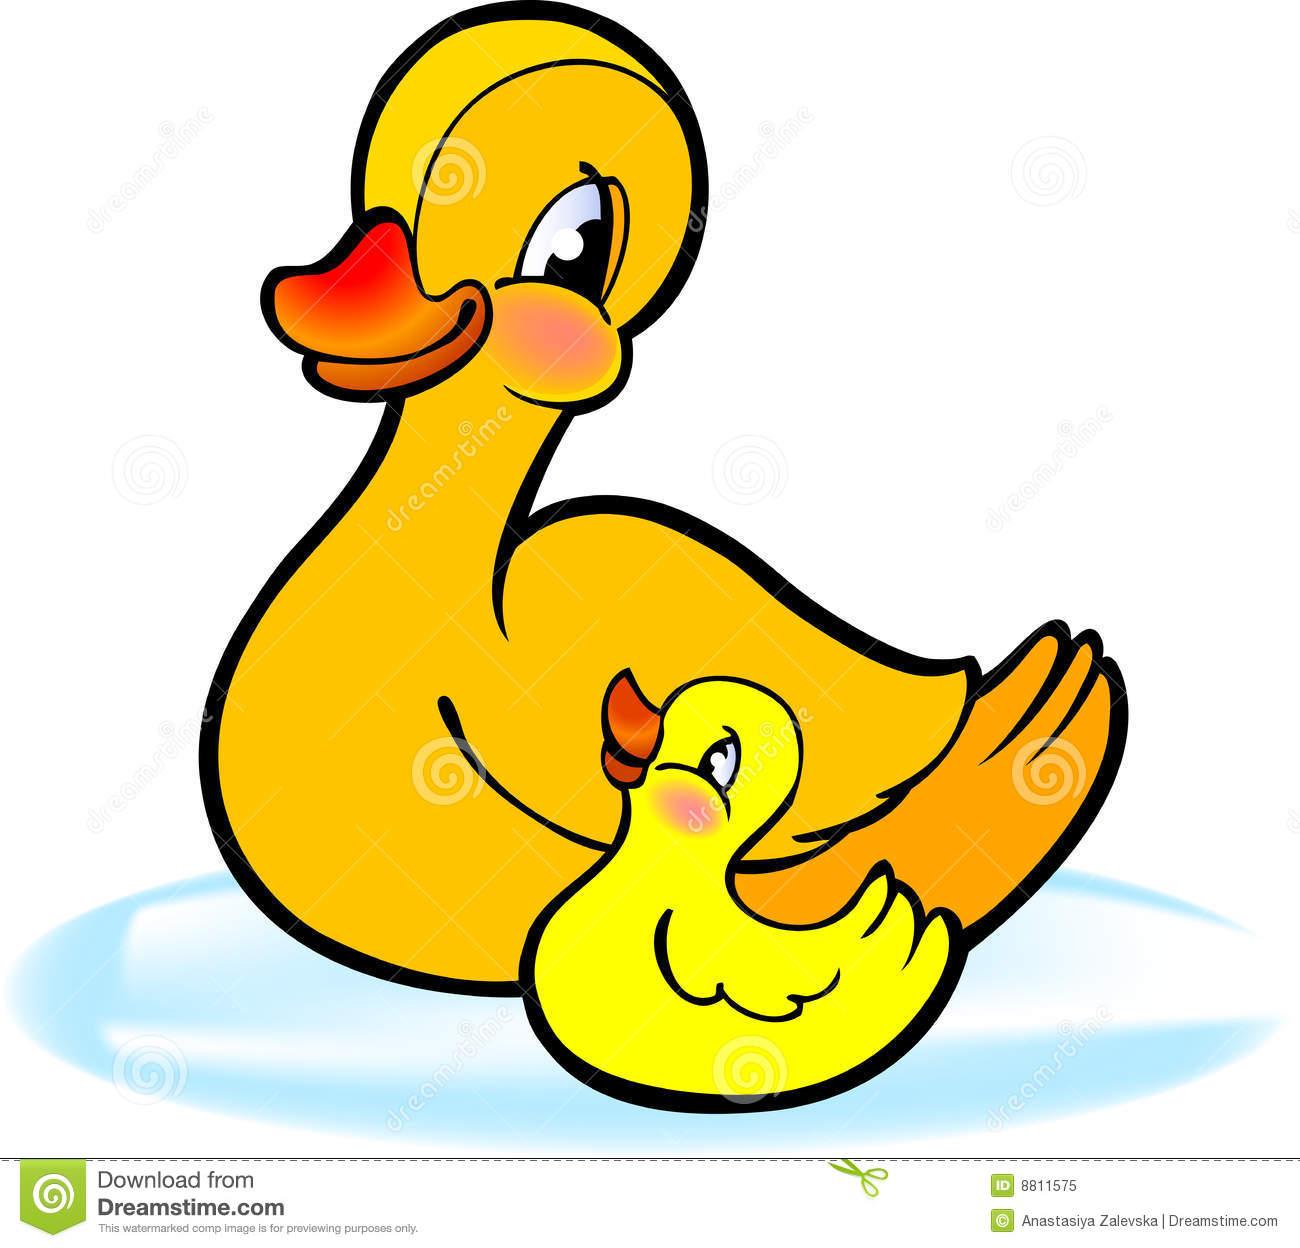 Mother duck clipart.